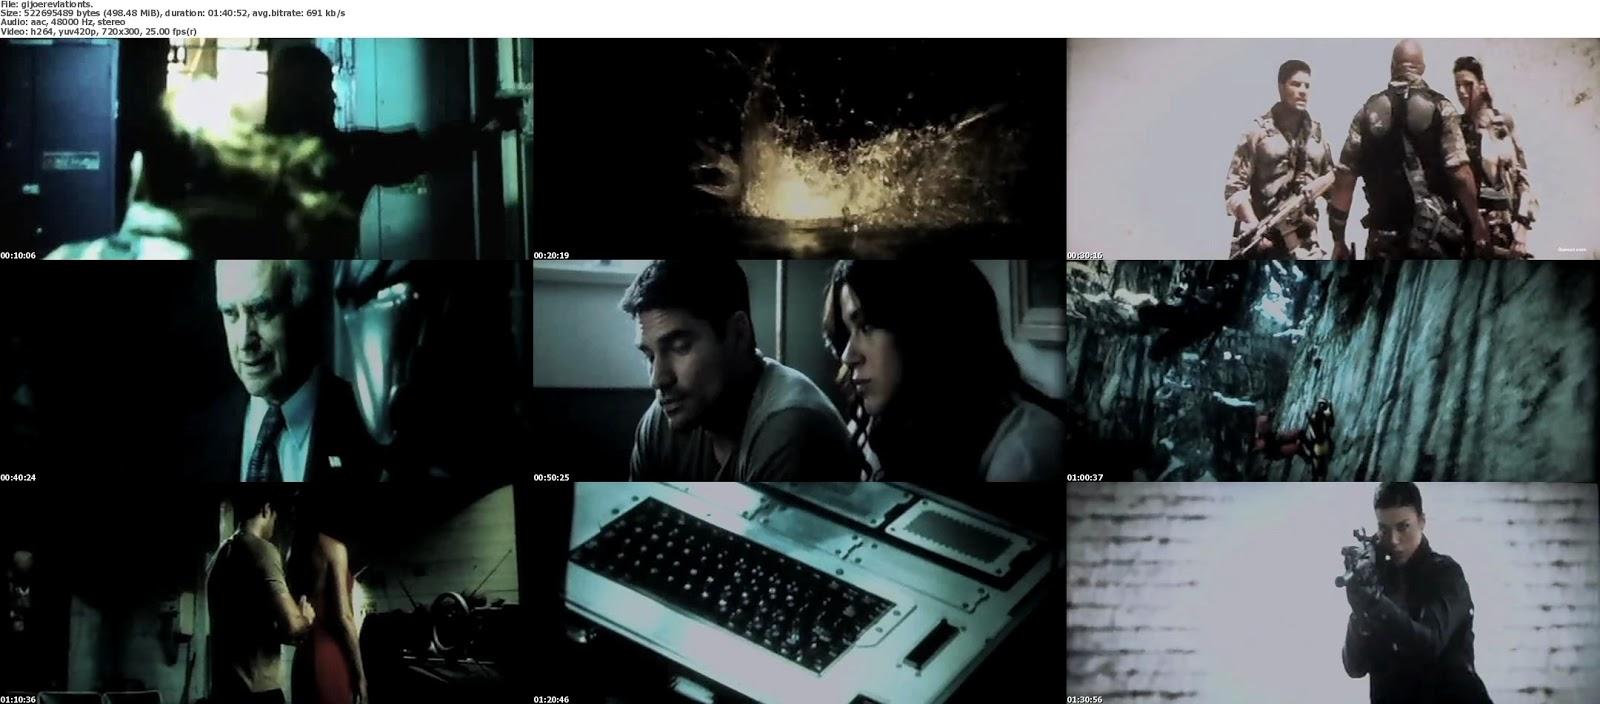 G.I.+Joe+Retaliation+(2013)+PROPER+TS+500MB++Hnmovies